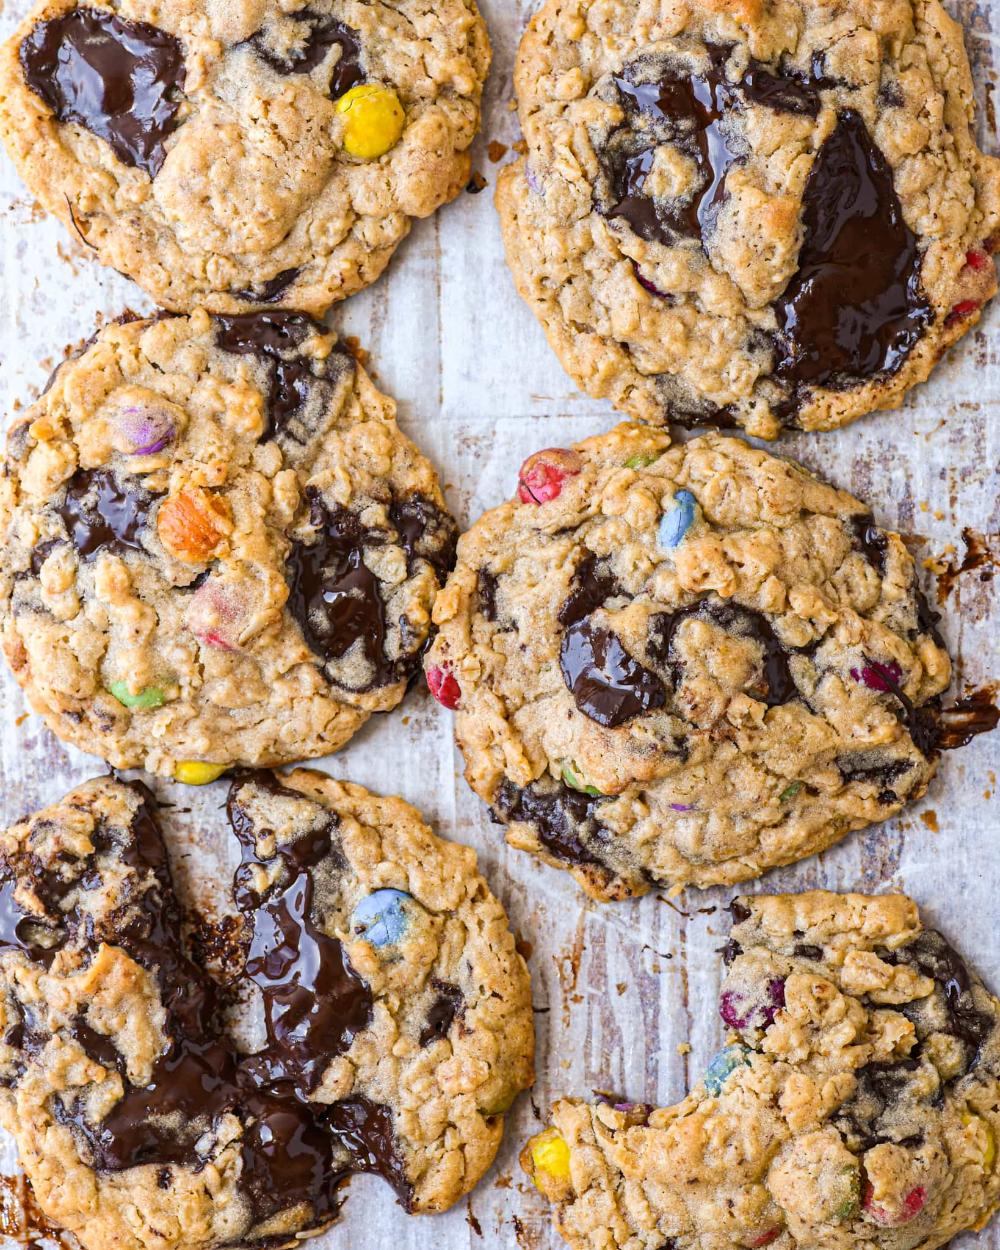 1 Egg Yolk 6 Monster Cookies Buttermilk By Sam Recipe In 2020 Monster Cookies Recipe Monster Cookies How Sweet Eats